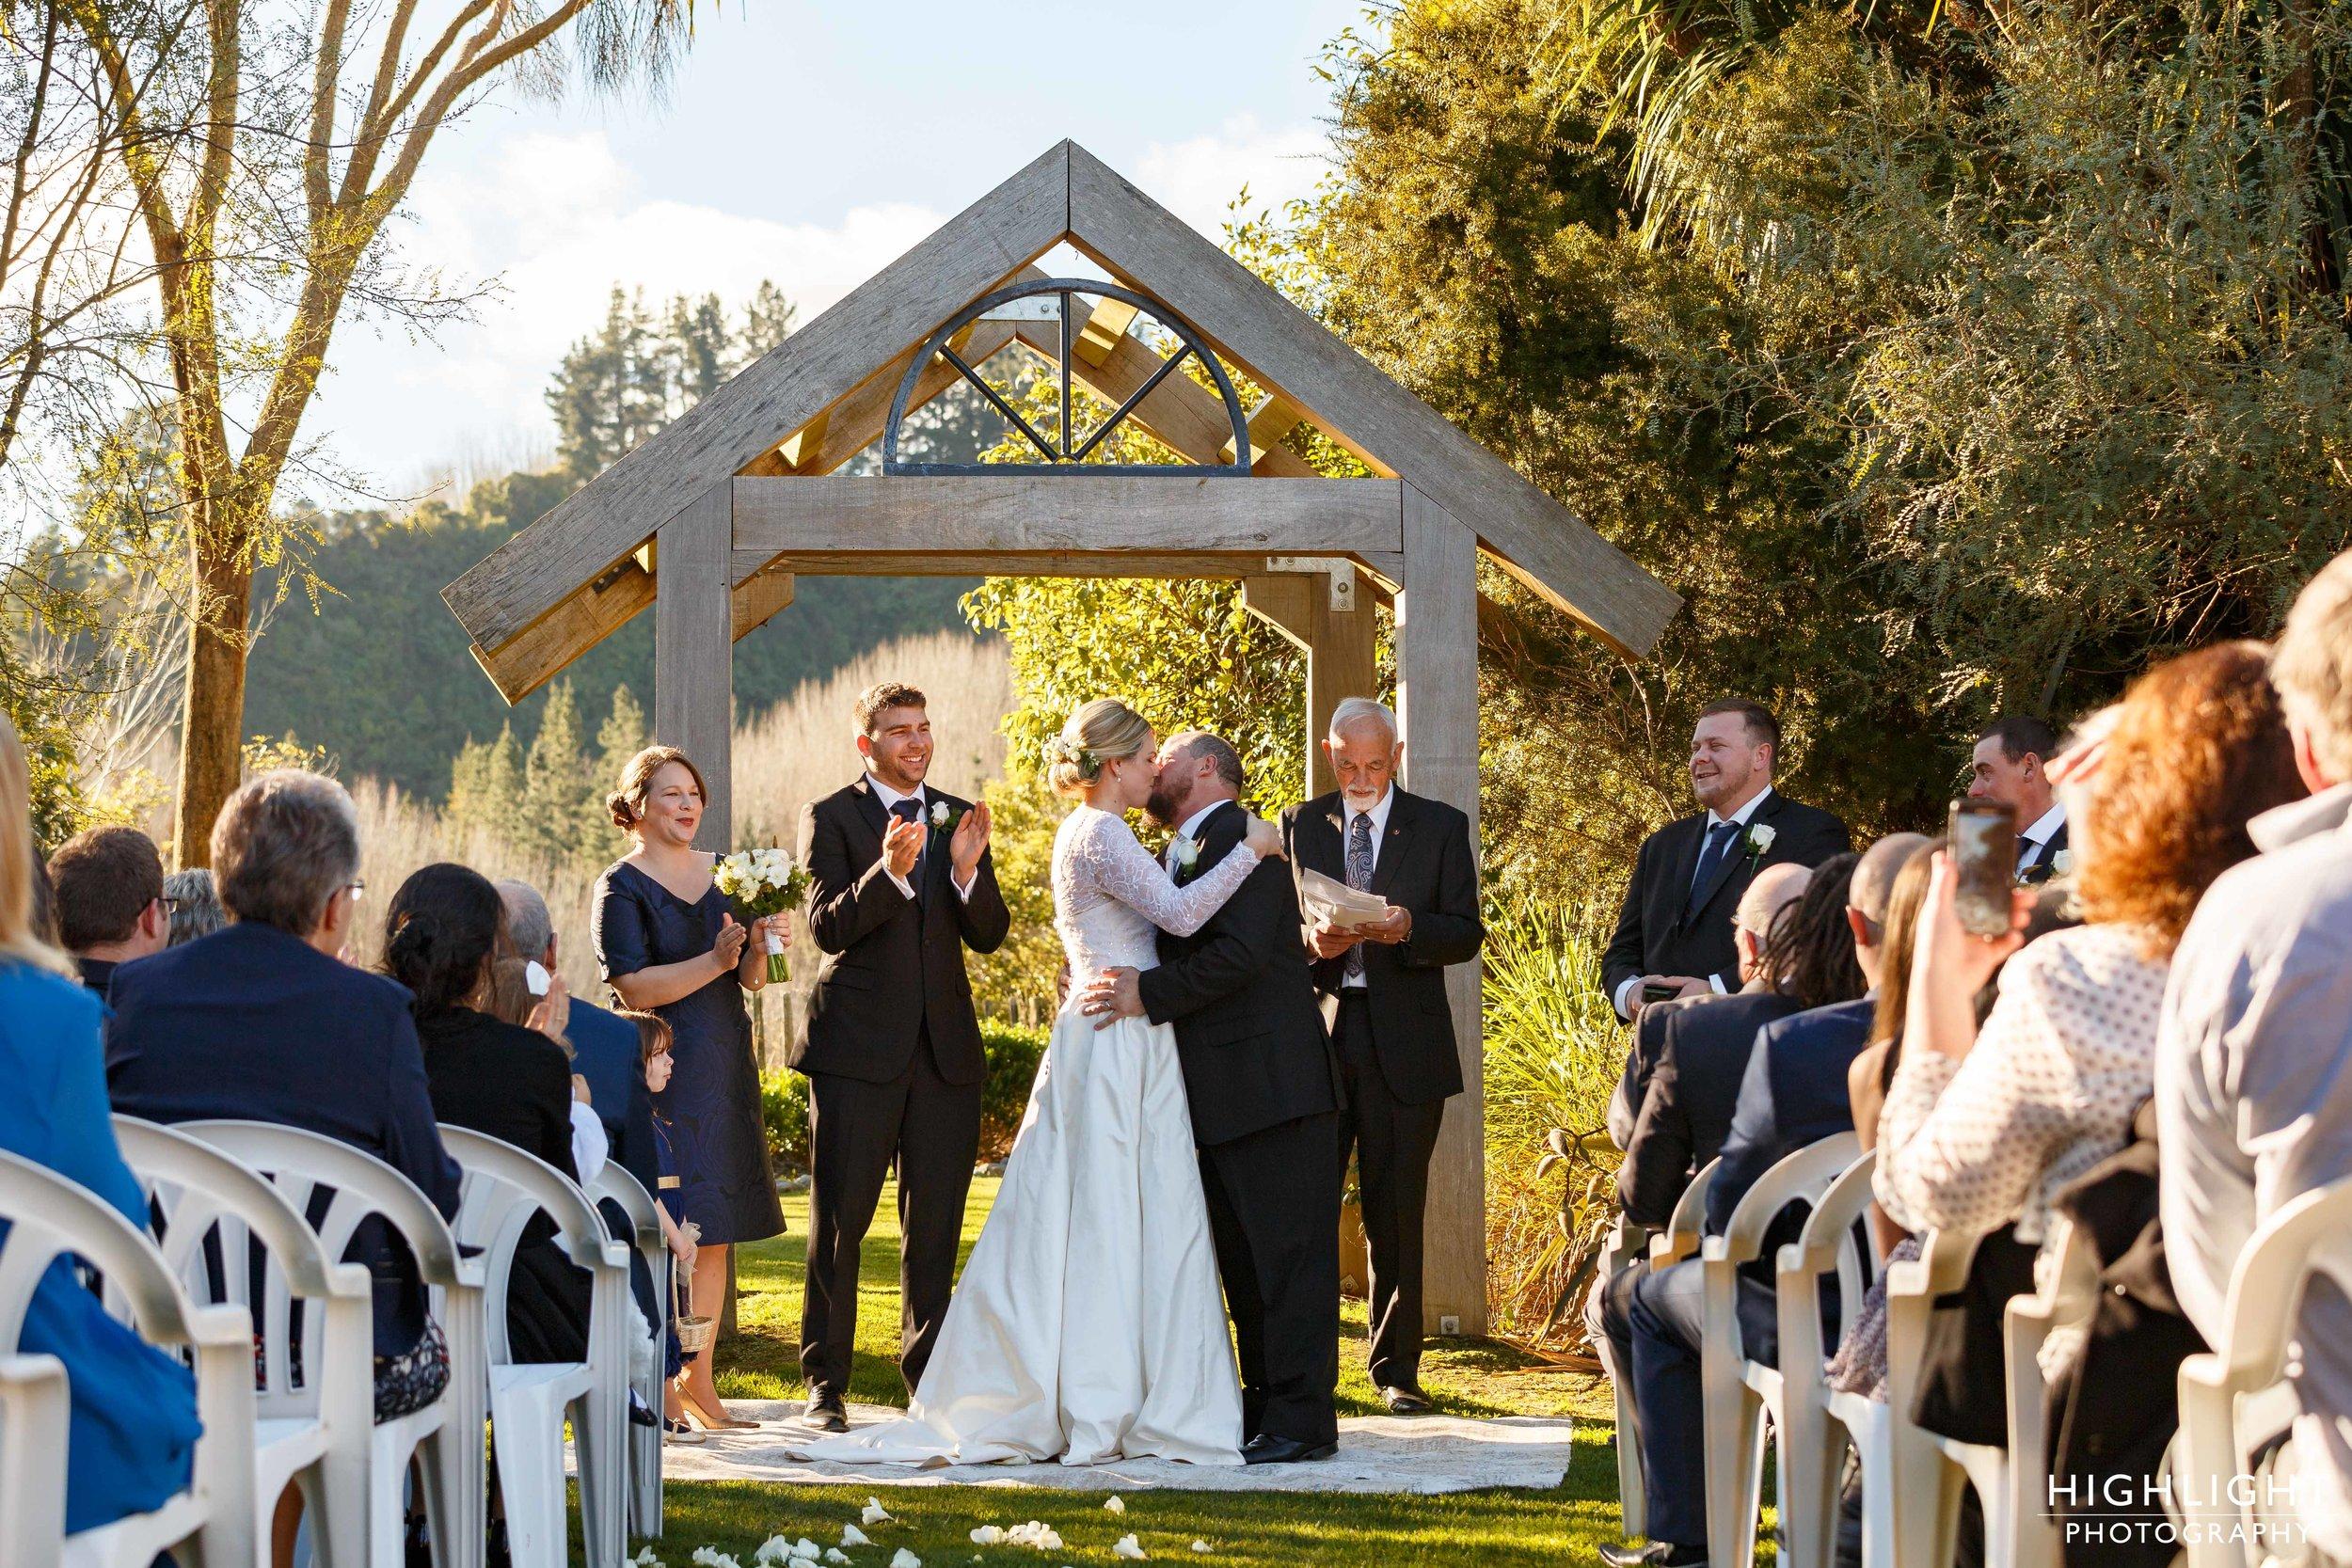 makoura-wedding-photography-highlight-new-zealand-36.jpg